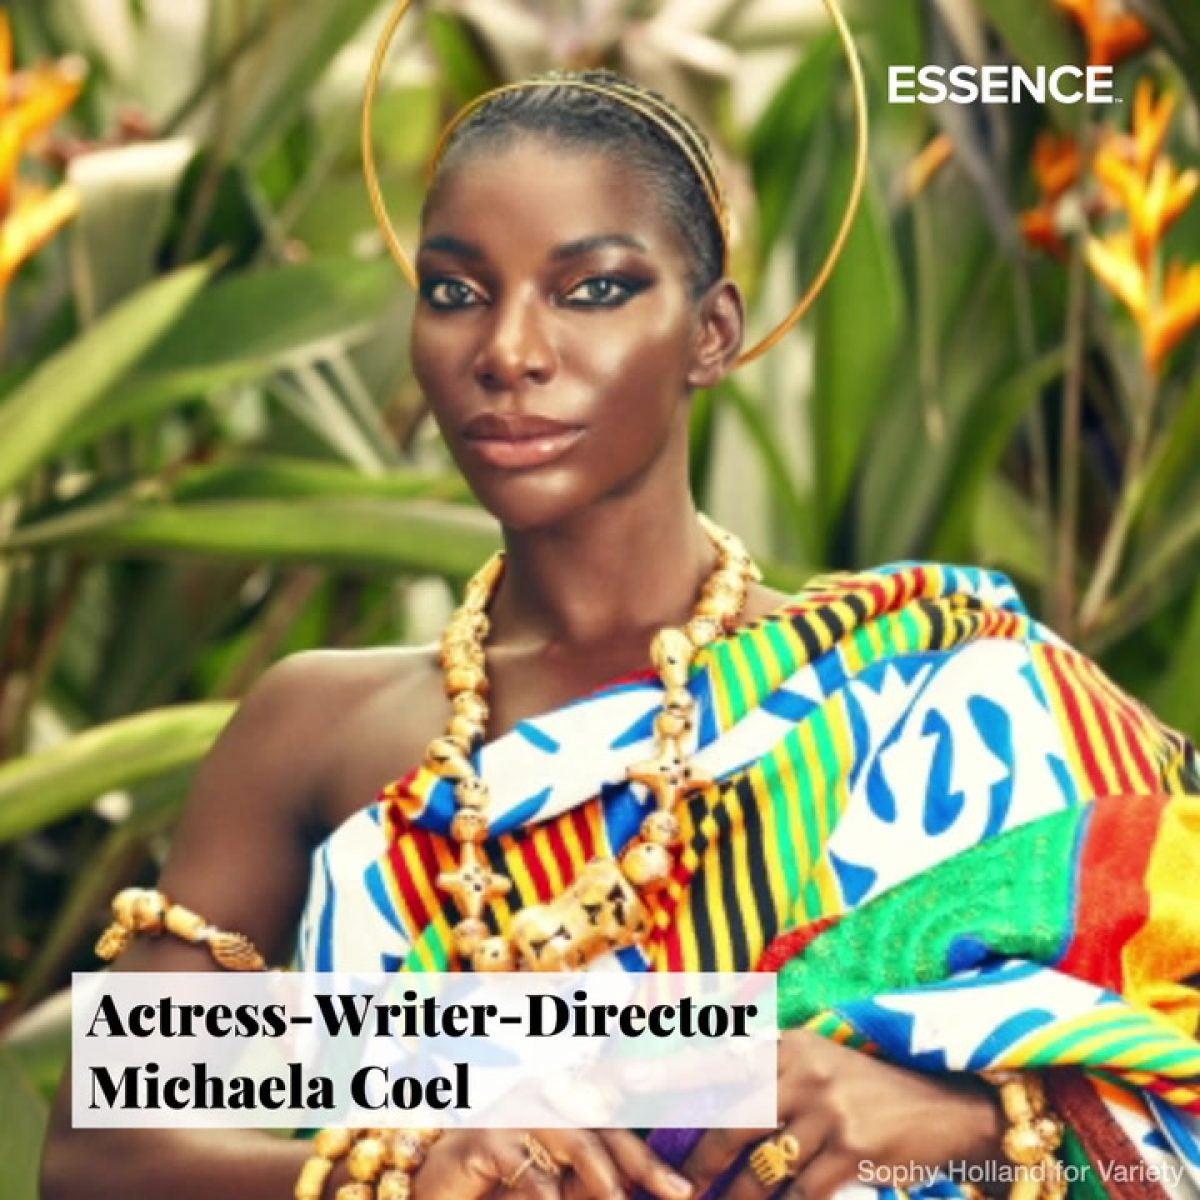 The Receipts | Michaela Coel